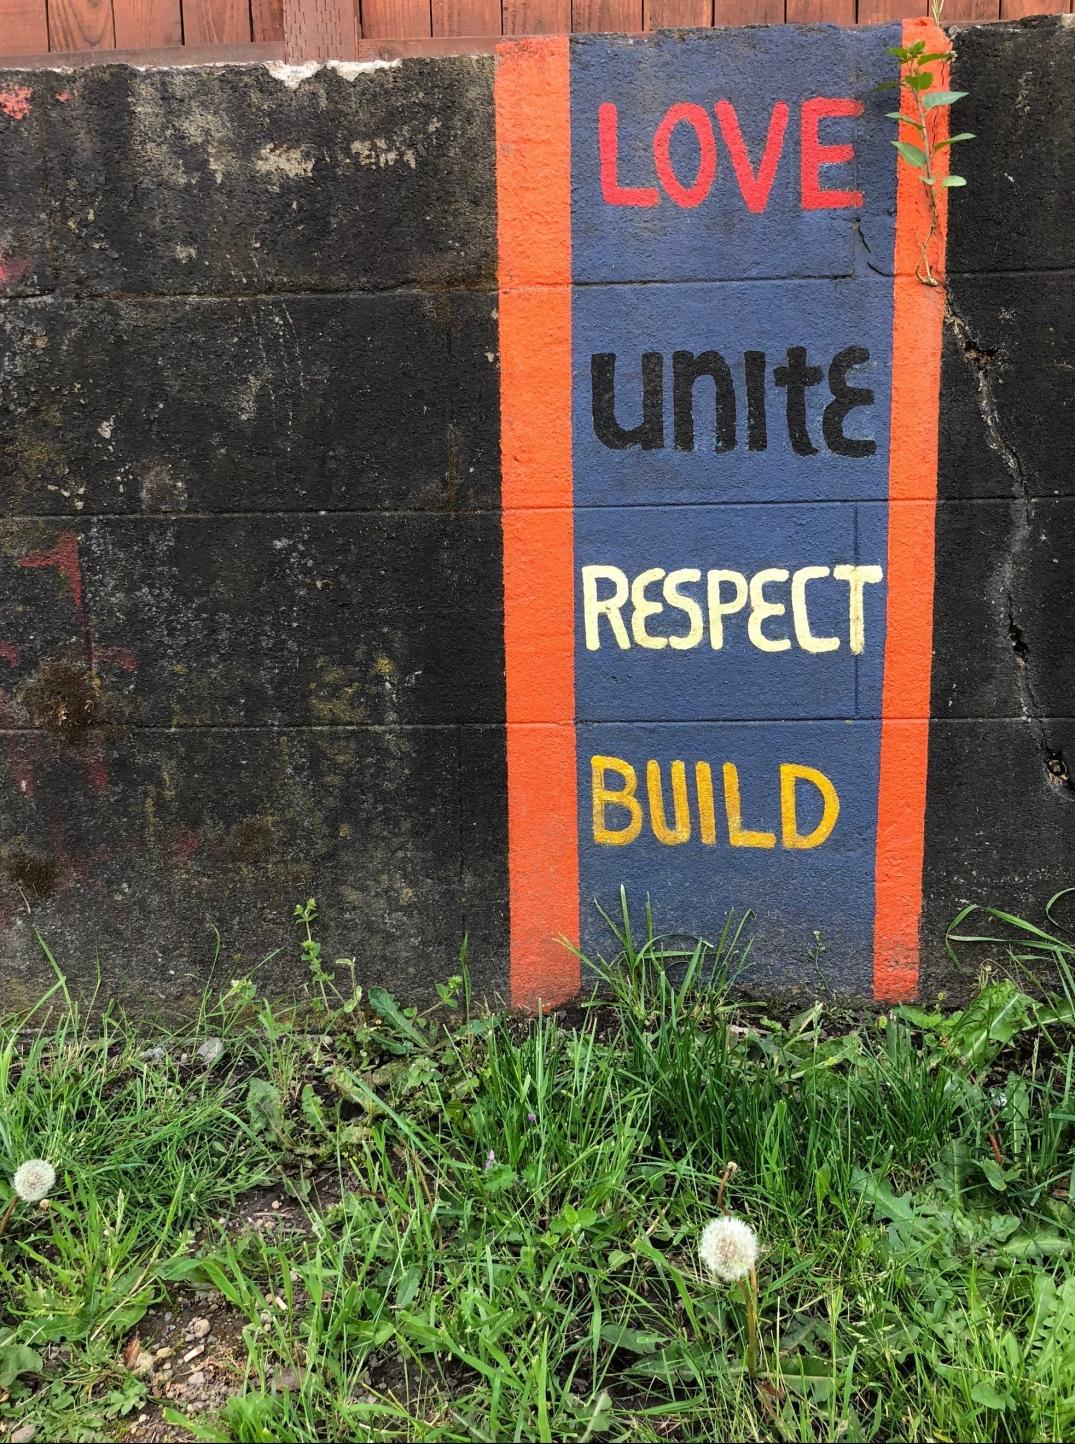 love-unite-respect-build-e1529099823200.jpg